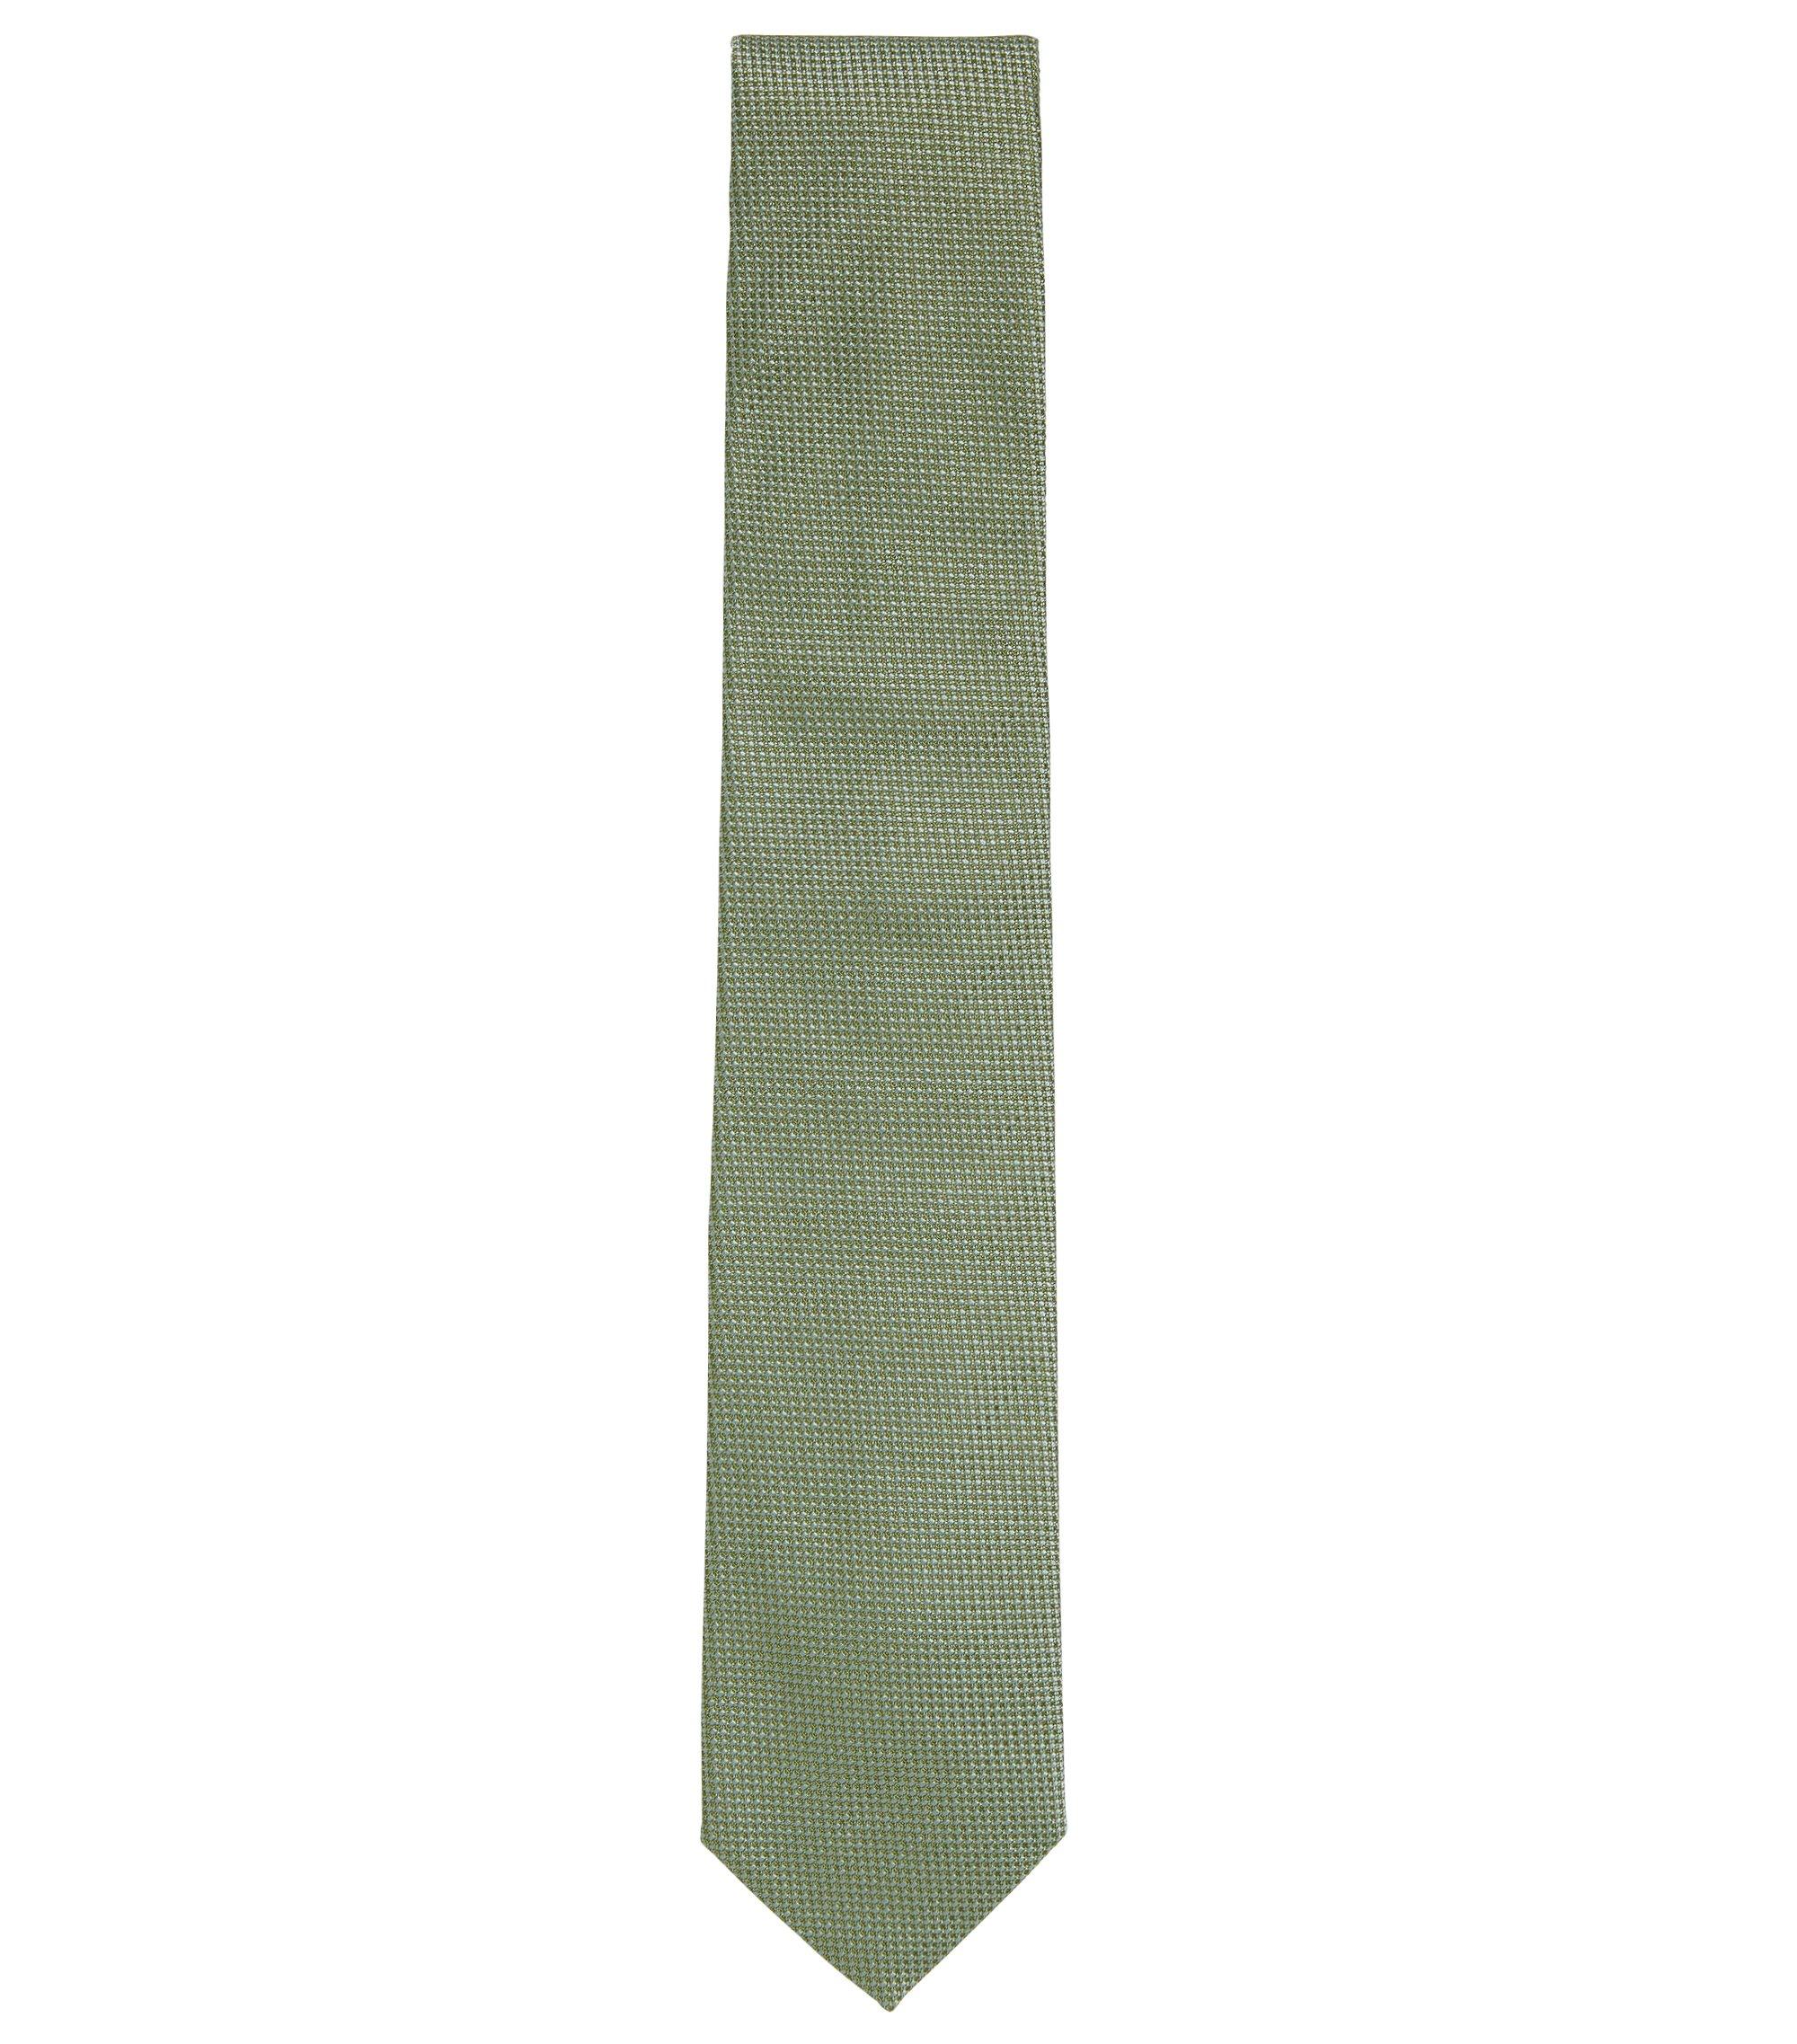 Embroidered Silk Tie, Regular | Tie 7.5 cm, Light Green